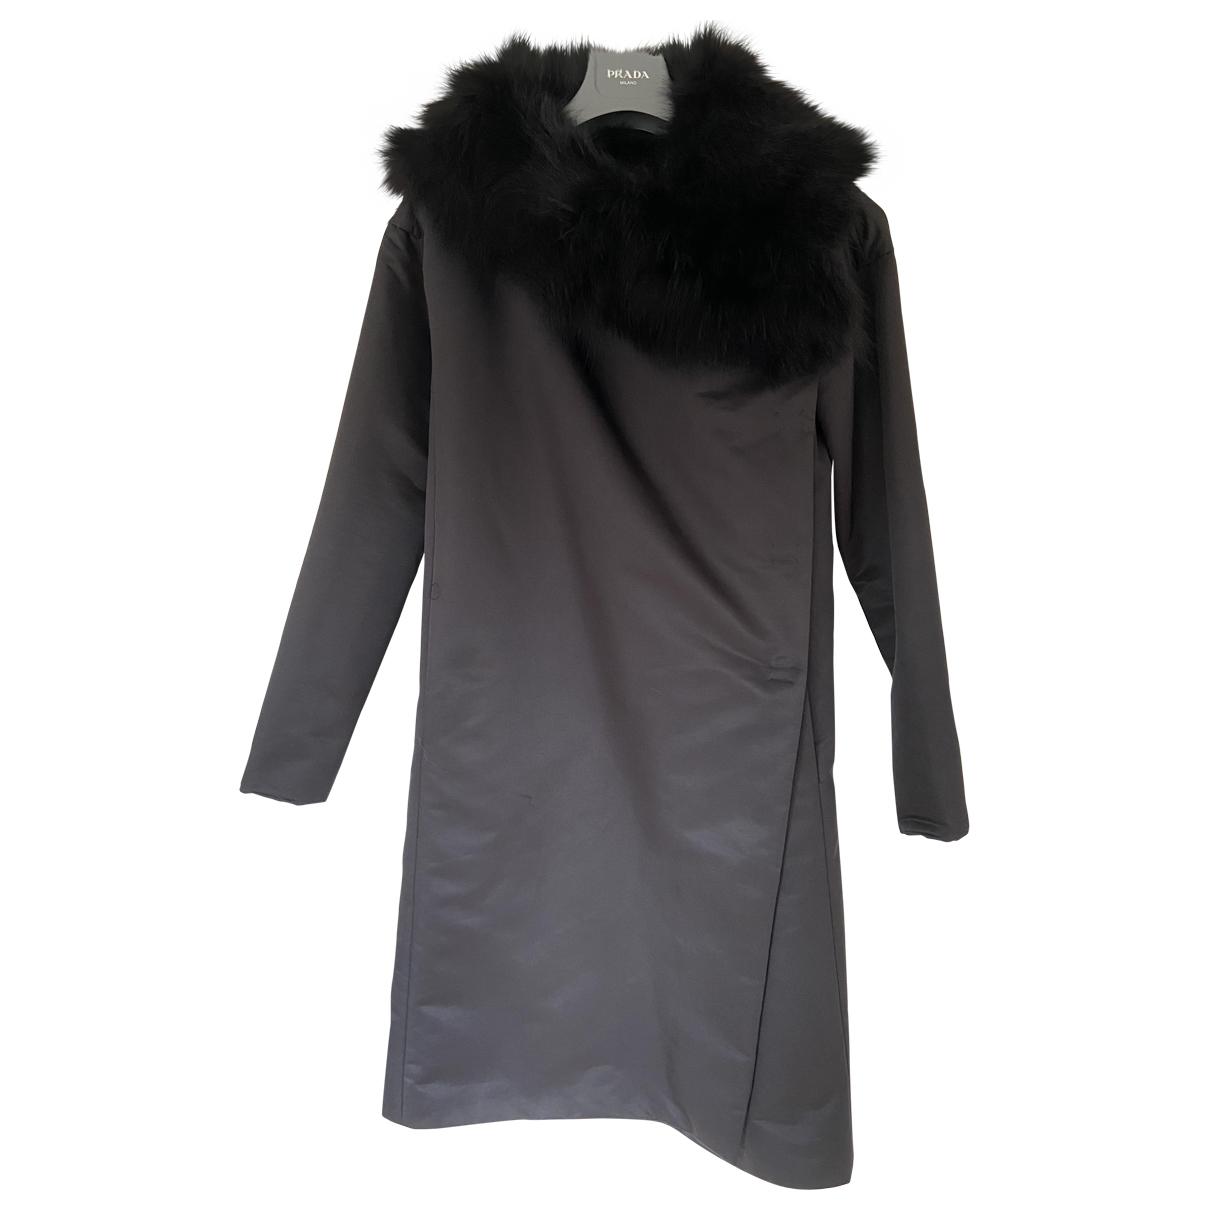 Miu Miu \N Black coat for Women 42 IT